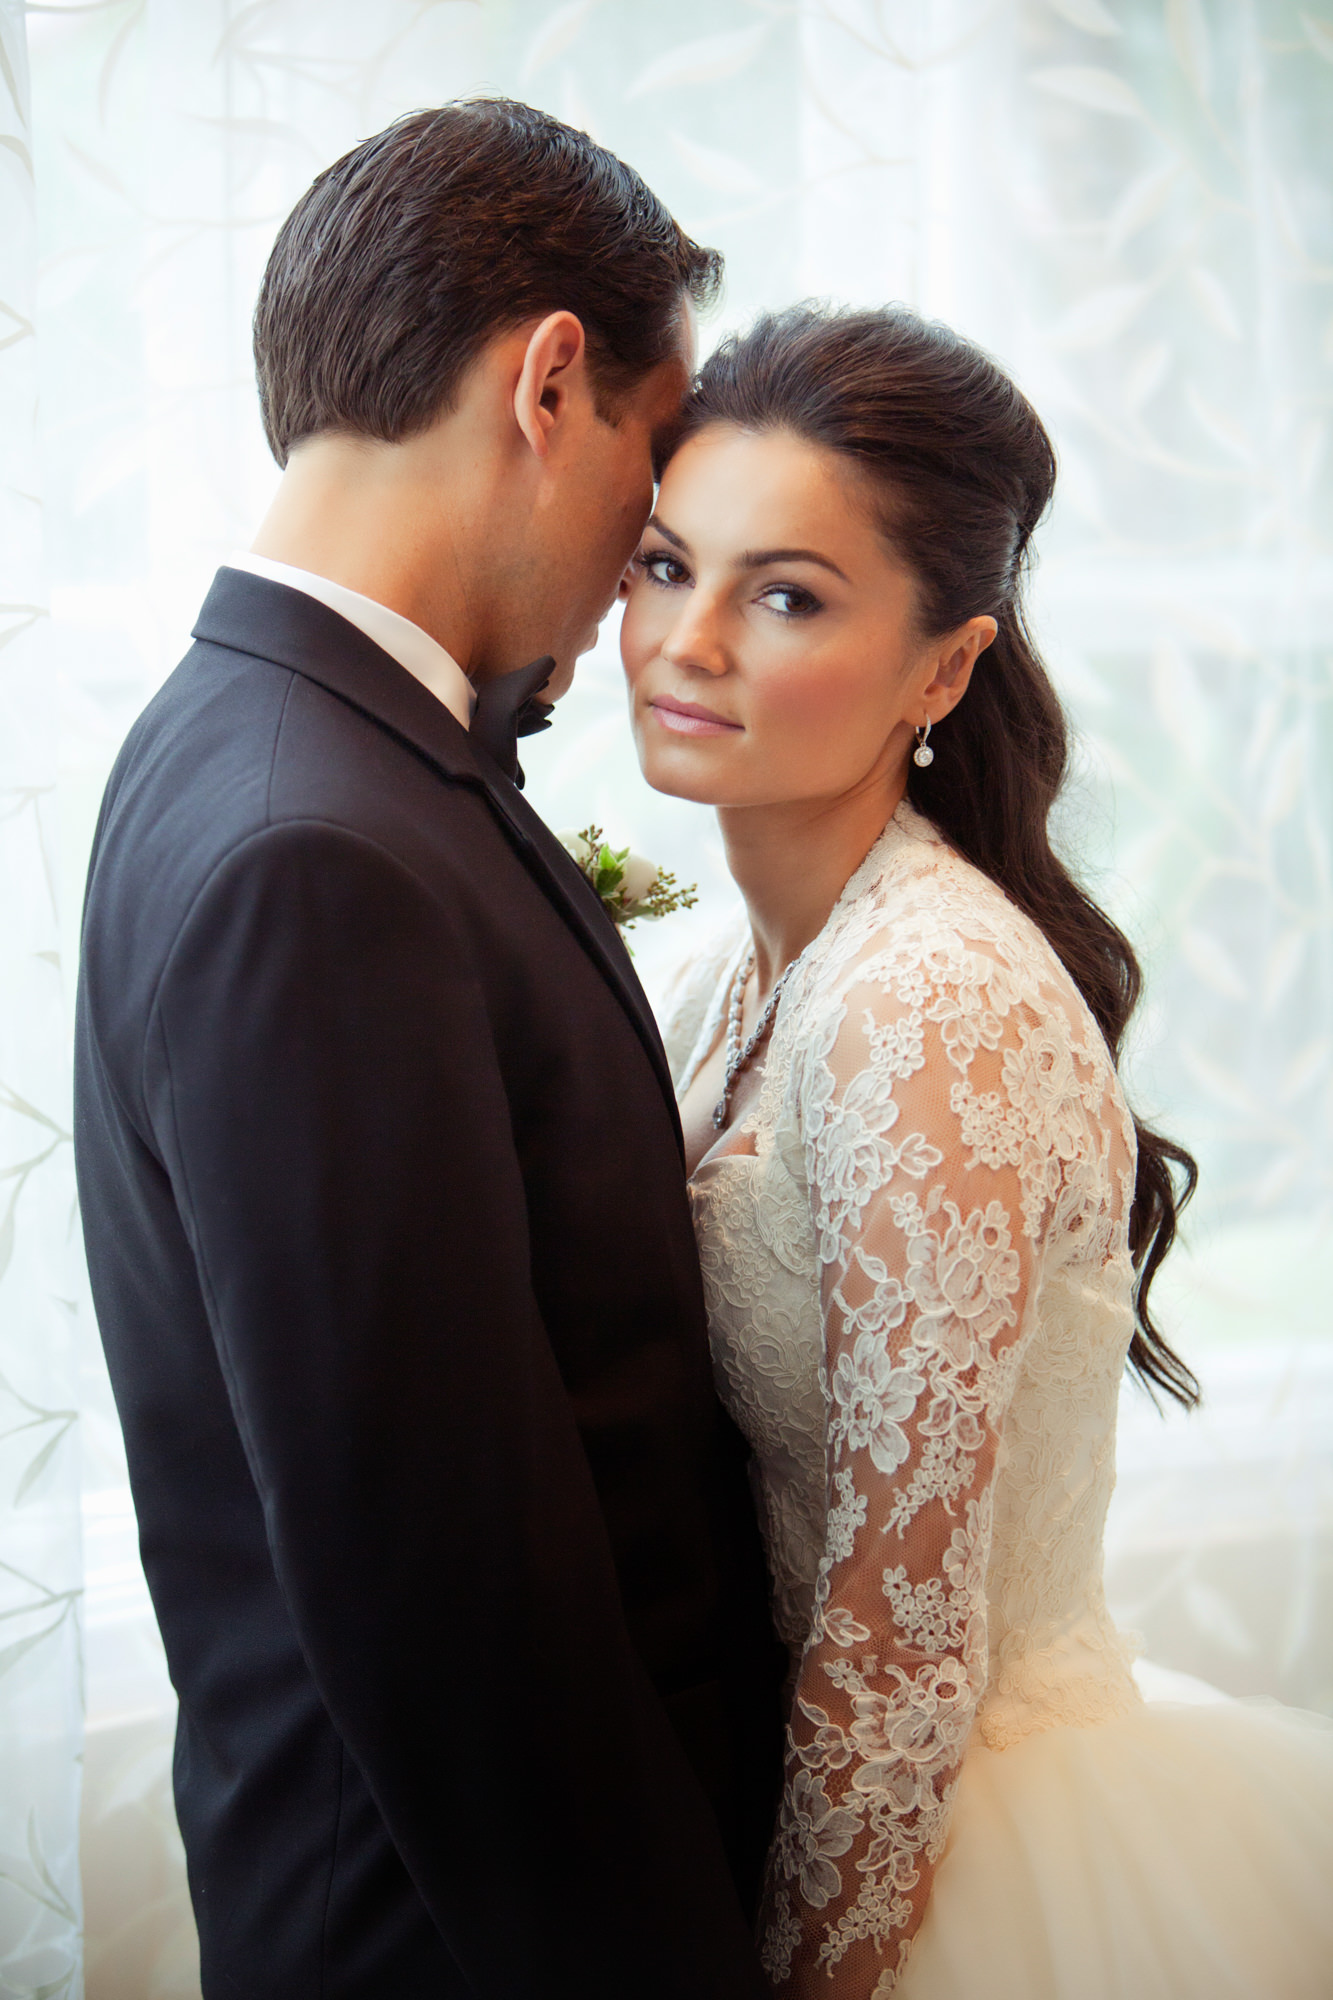 Elegant portrait of bride with groom  - Roberto Valenzuela Weddings